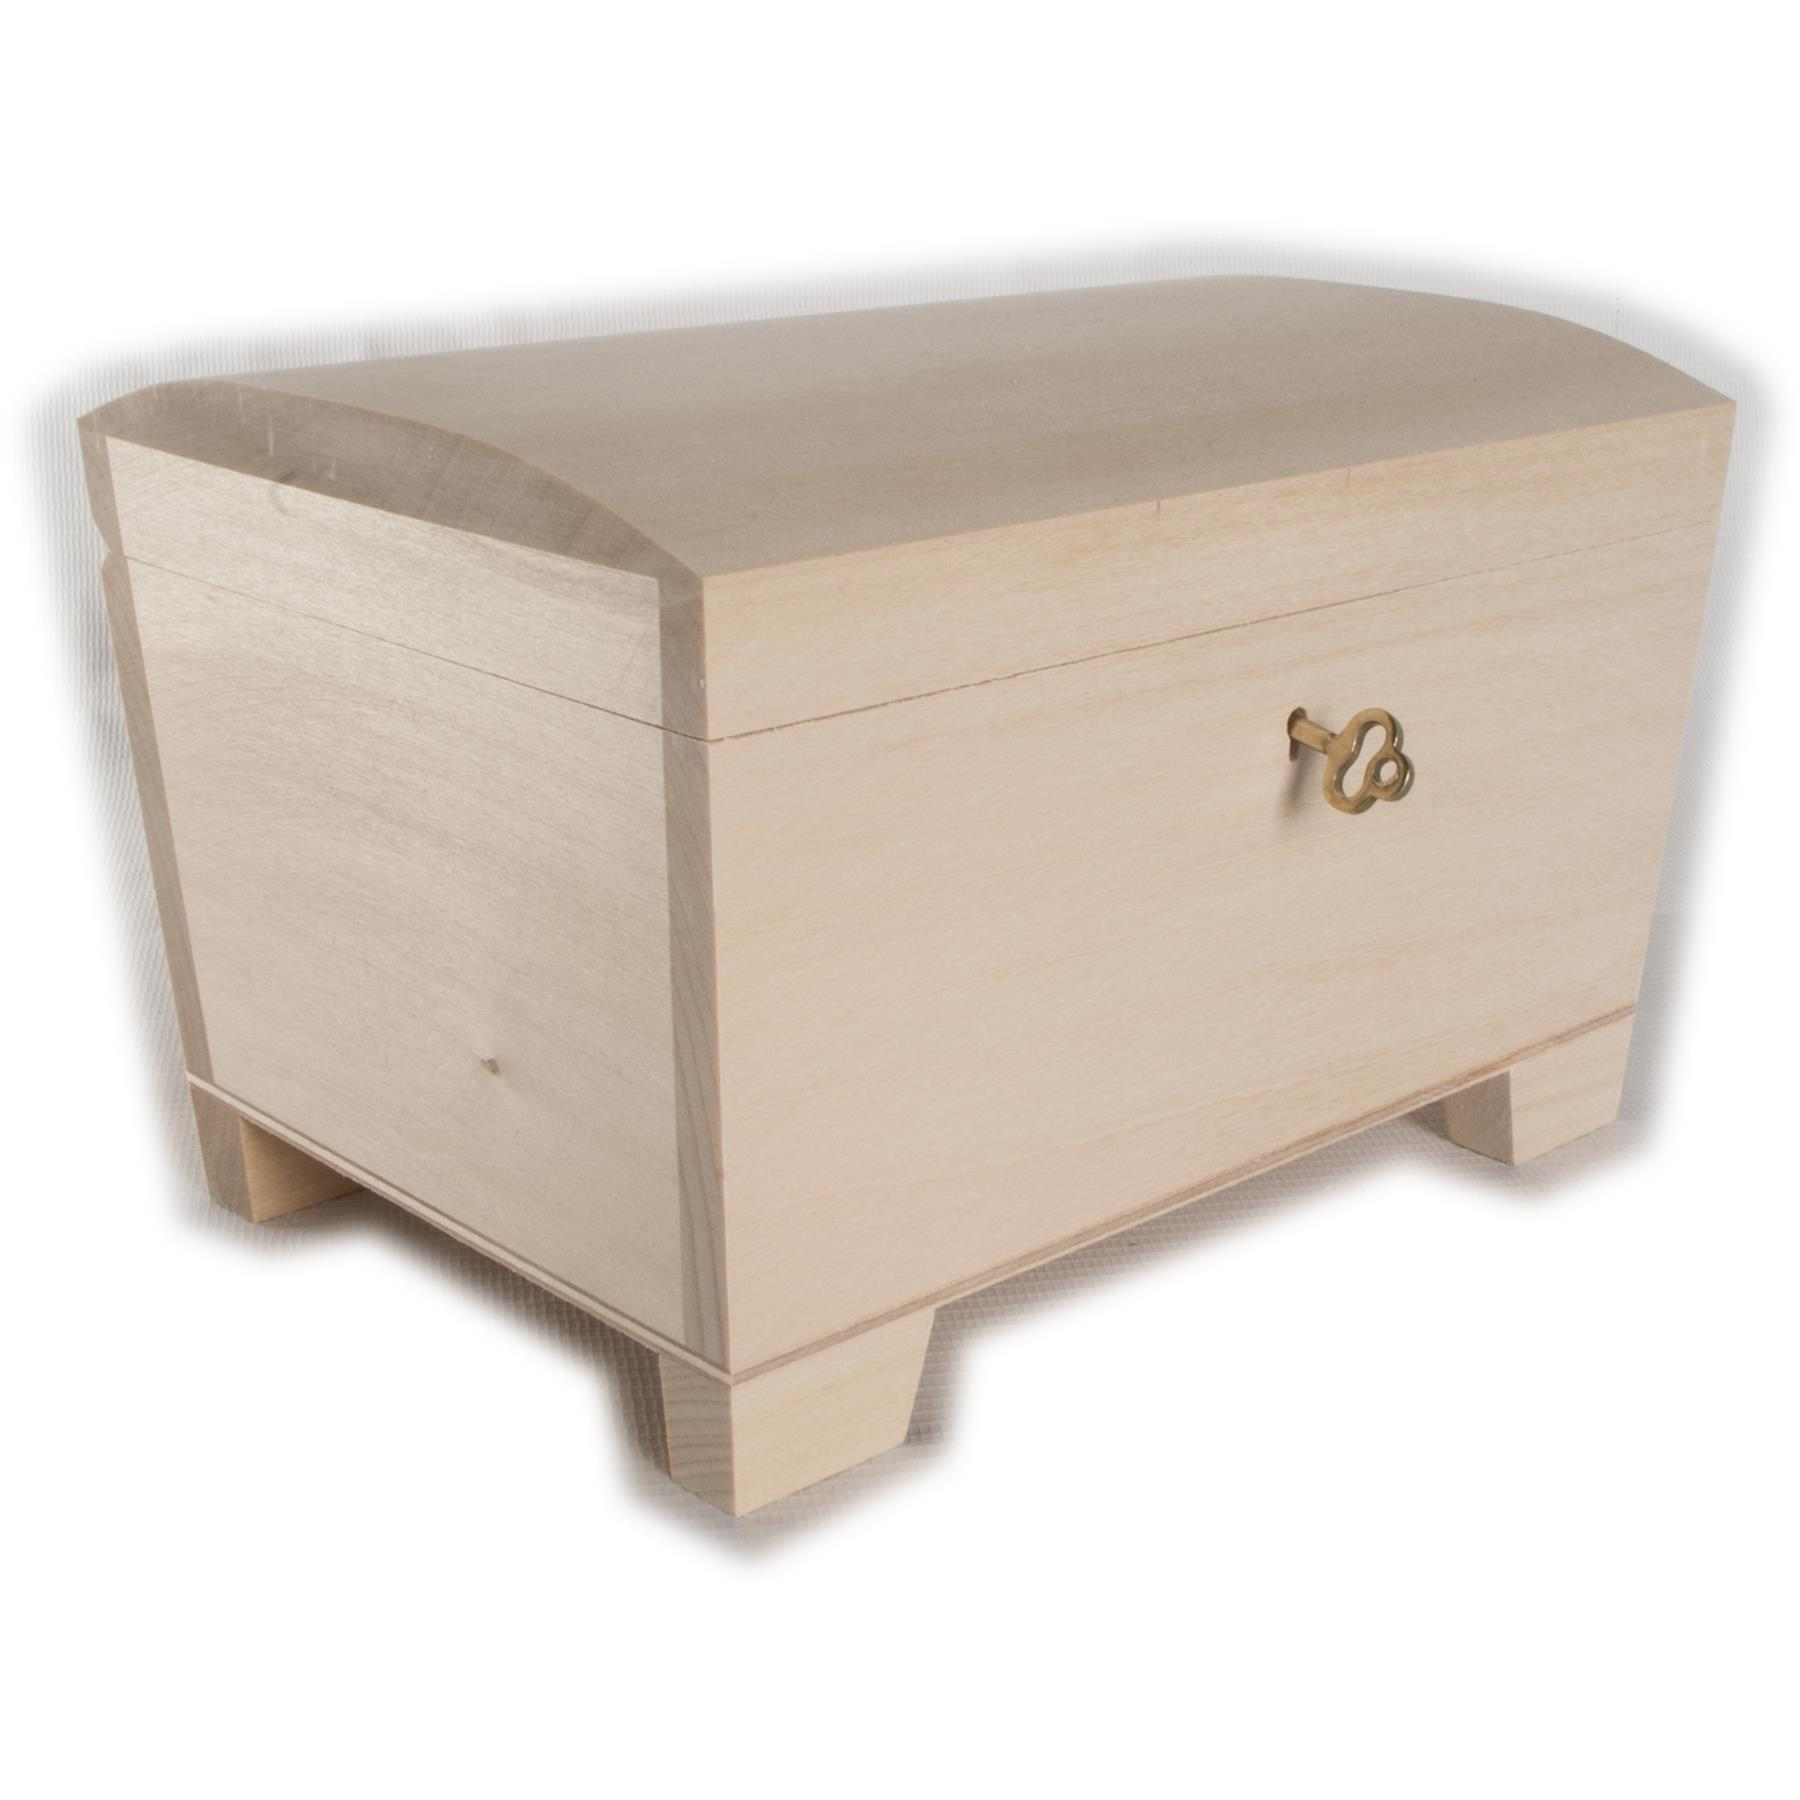 Sin Pintar Nuevo Caja De Madera Recuerdo Souvenirs Caja de memoria 24 Cm//// Art Craft Decoupage